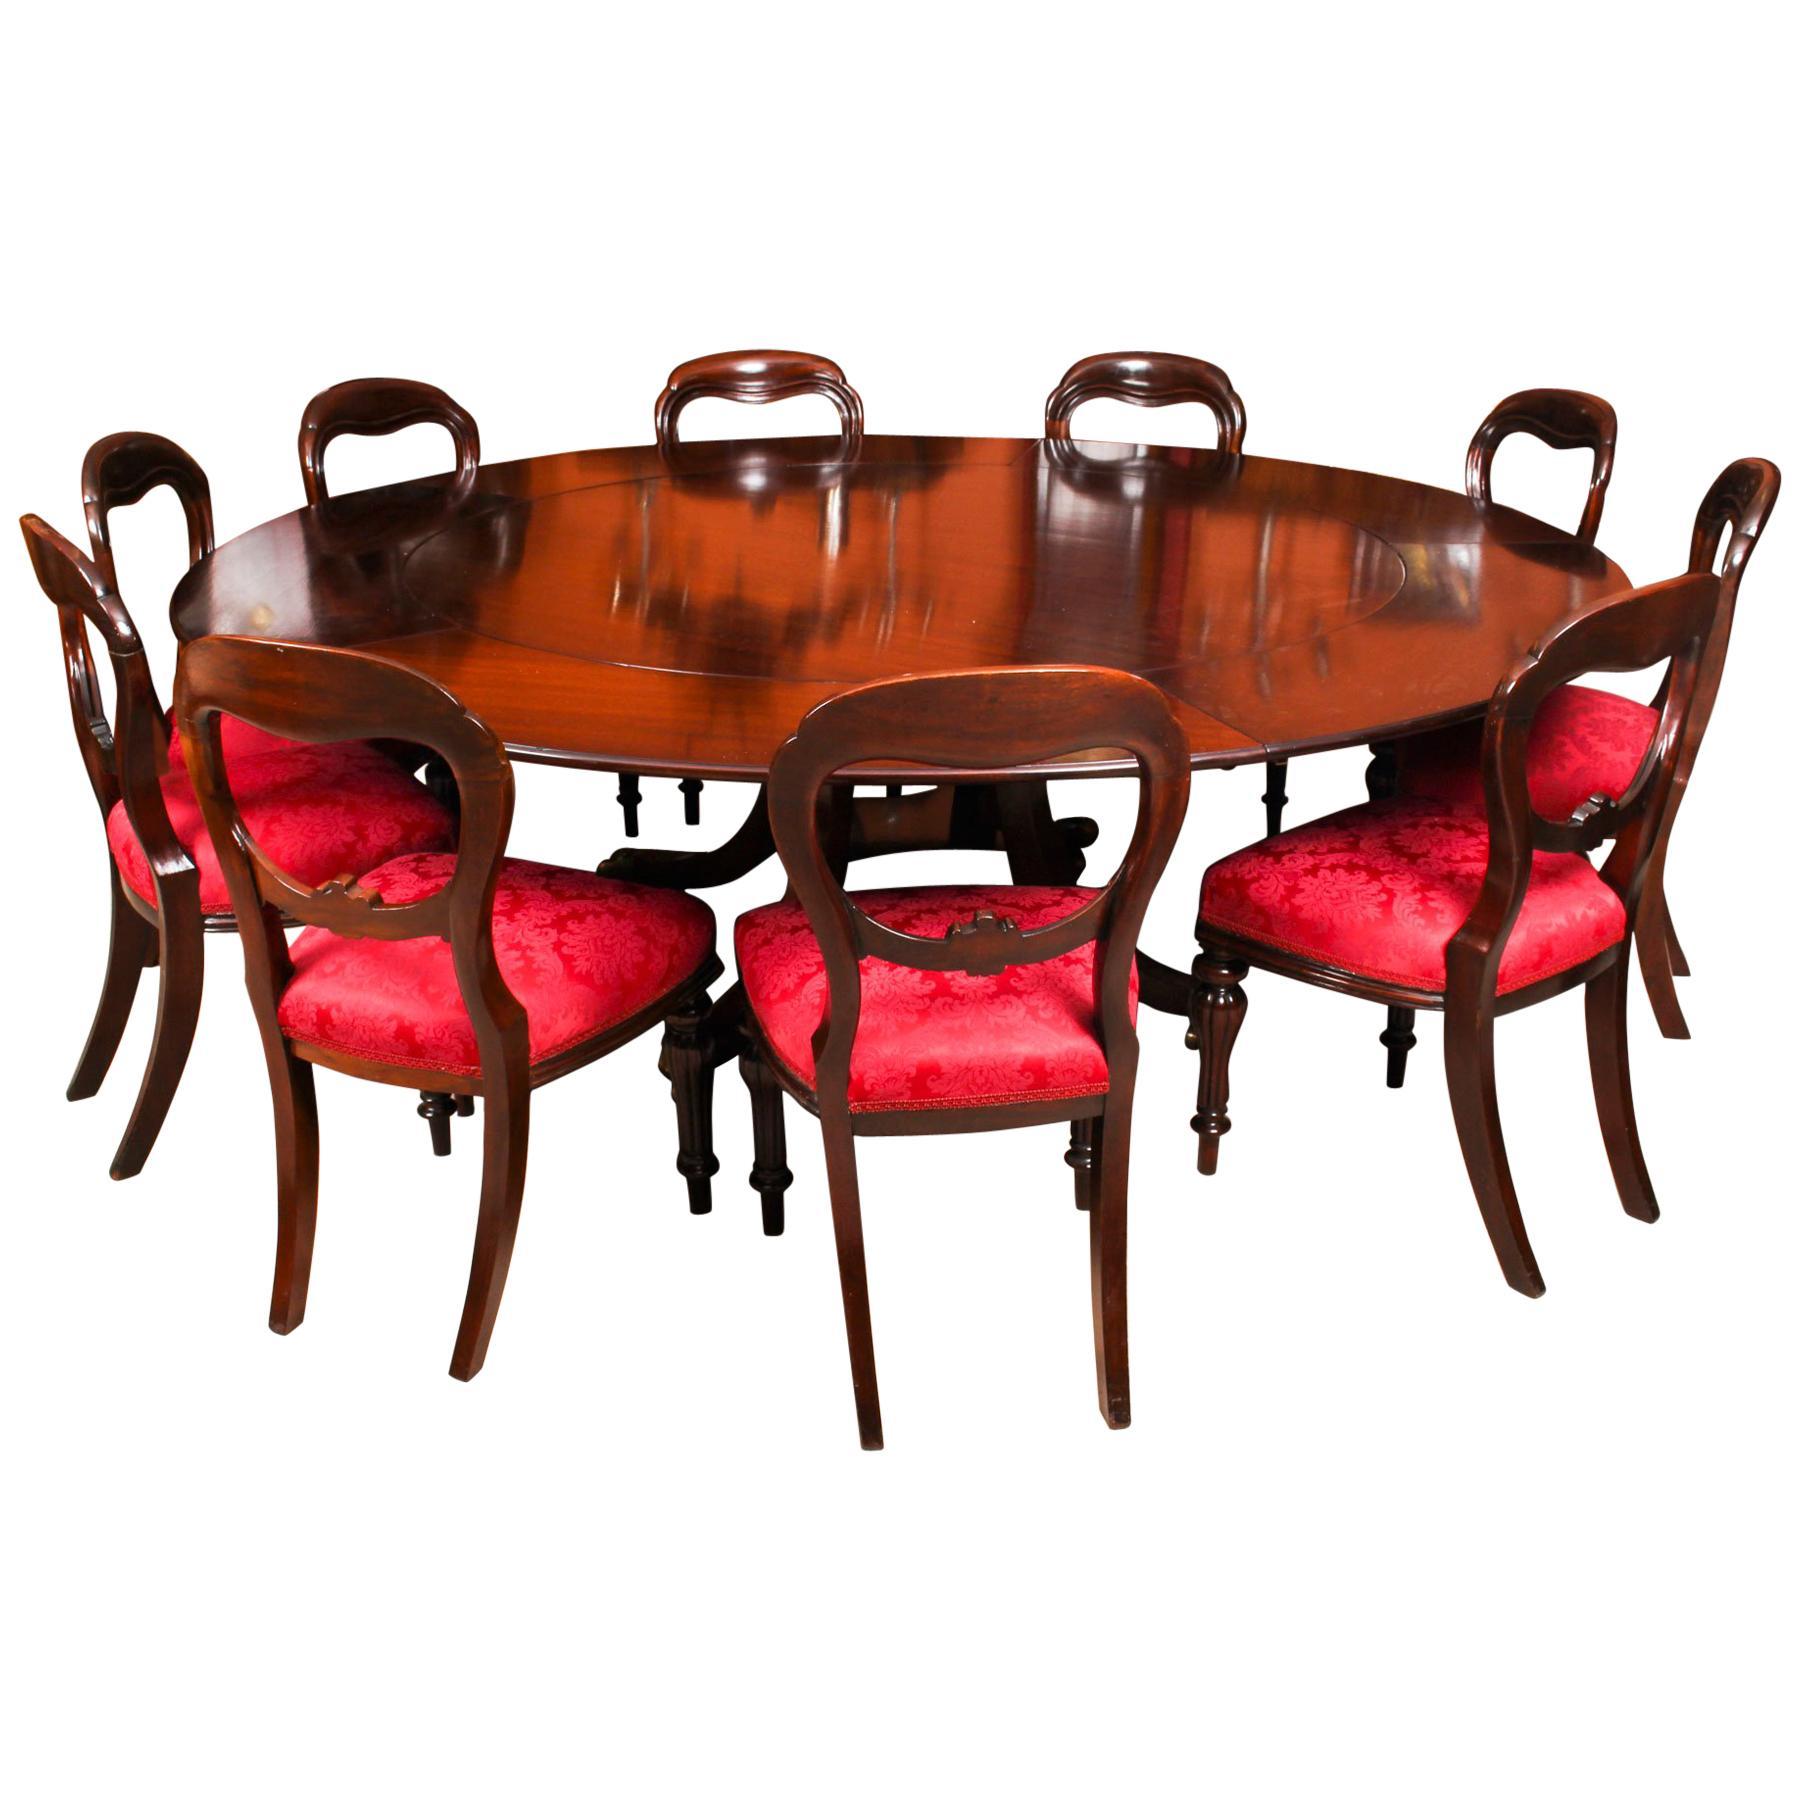 Art Deco Mahogany Dining Room Set With Herring Bone Design